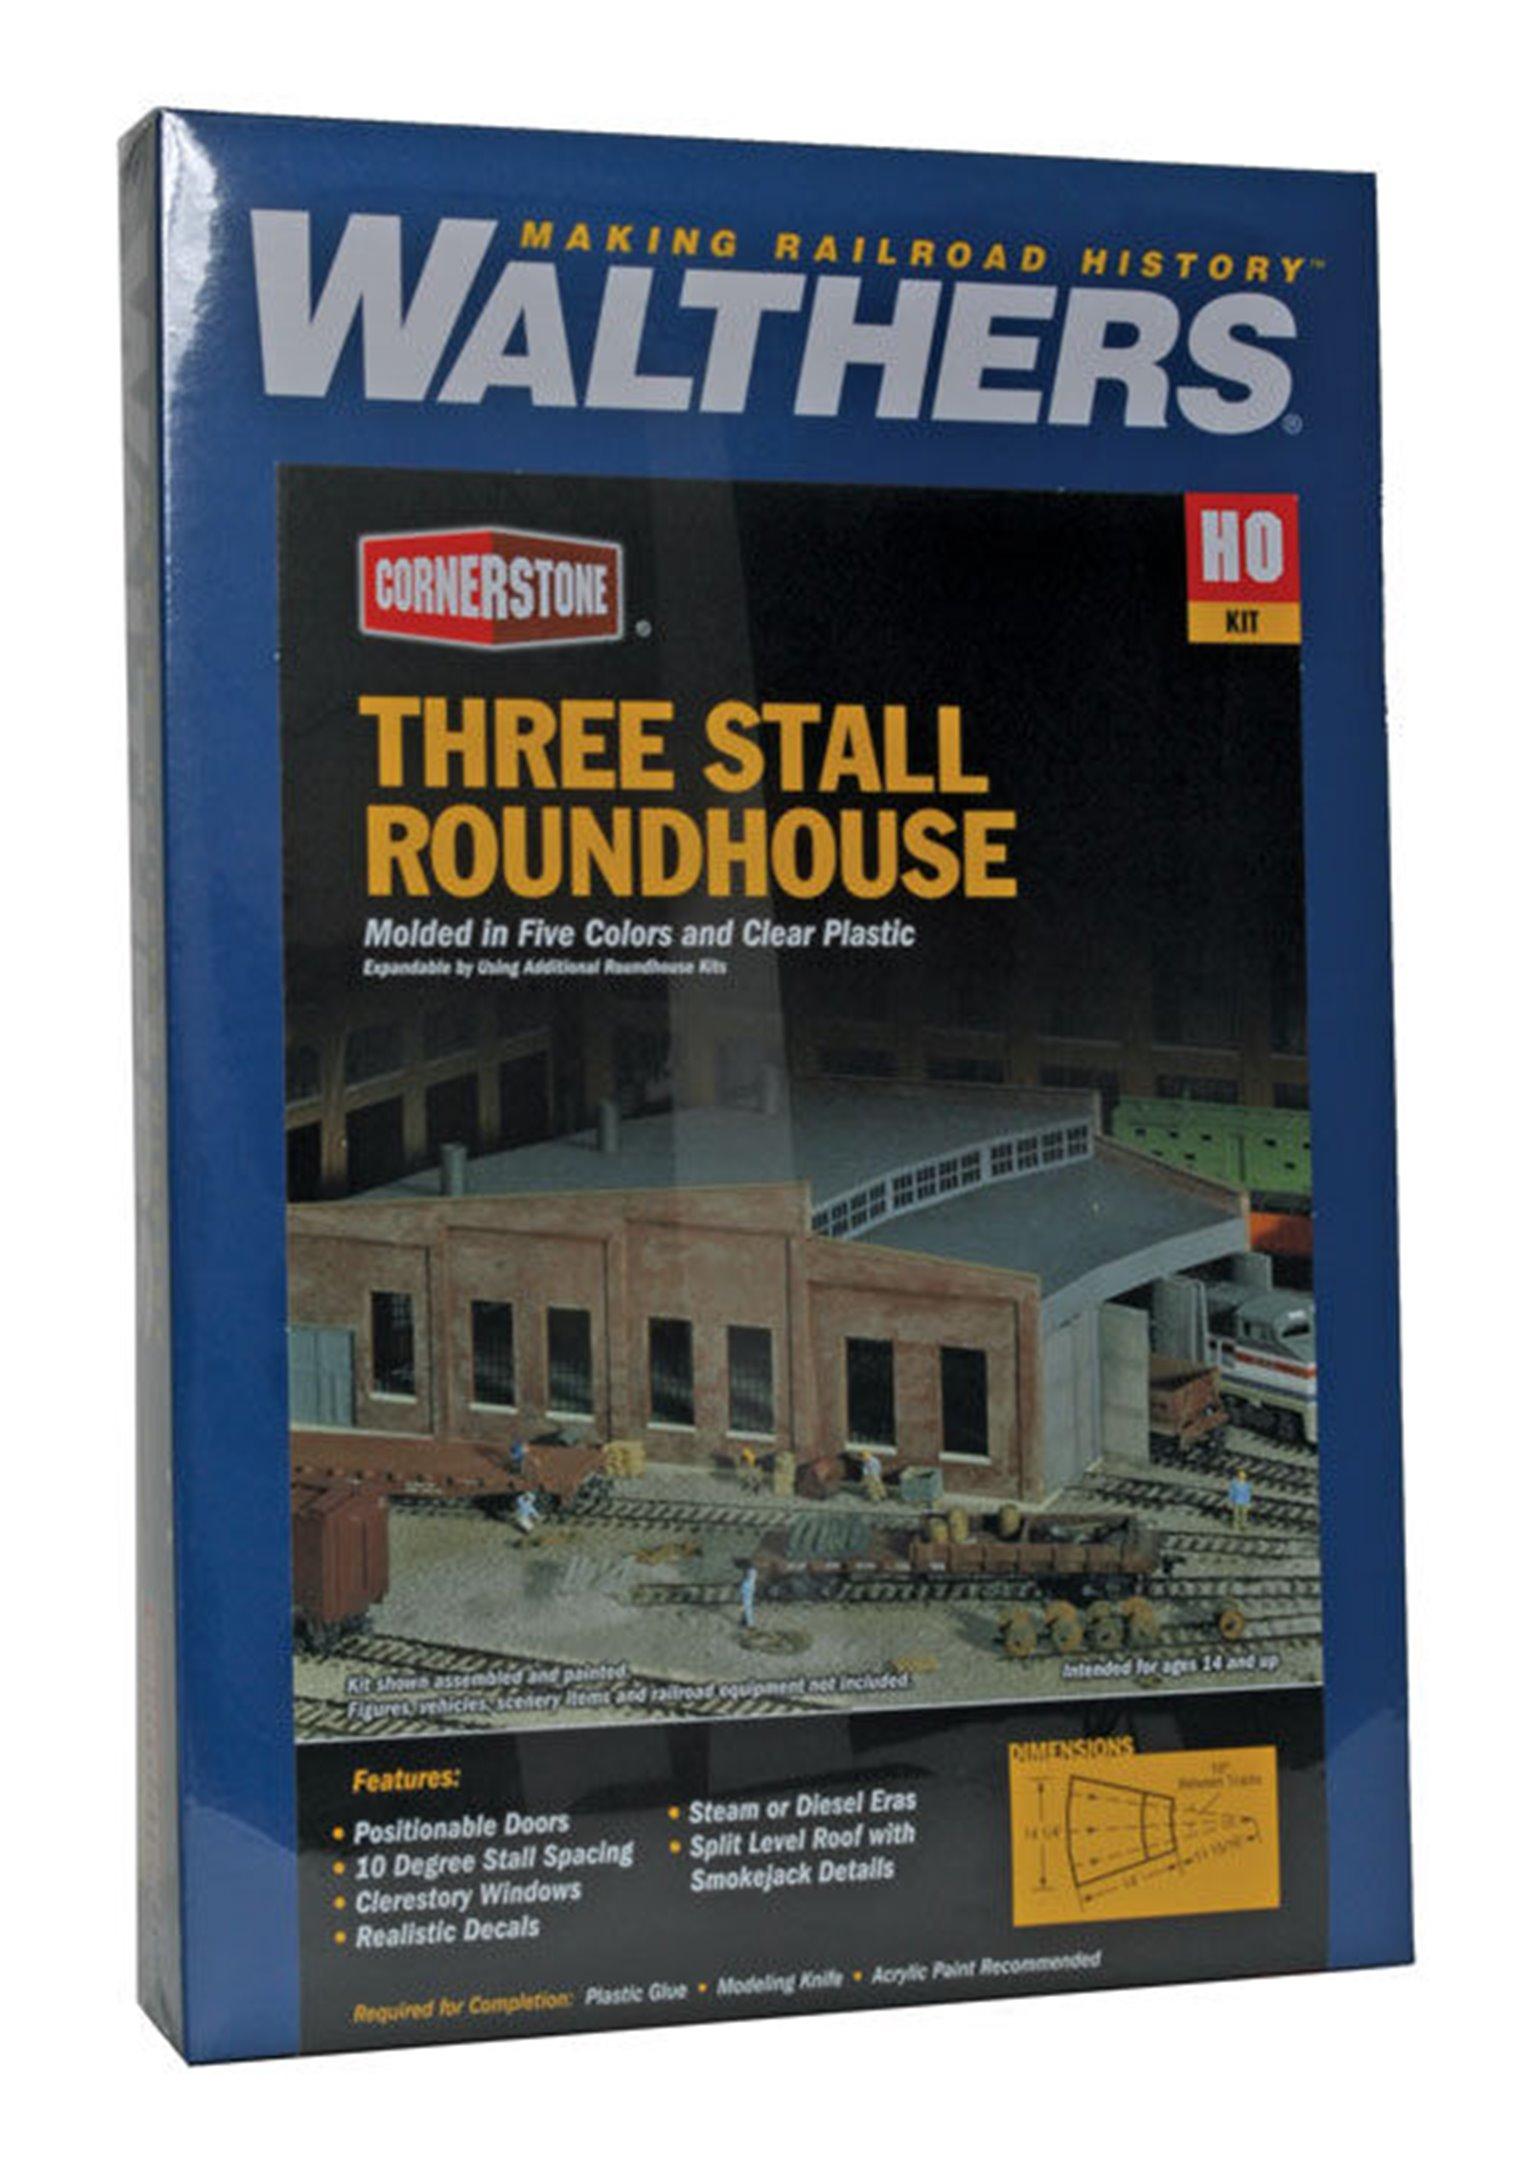 Roundhouse Three Stall Kit